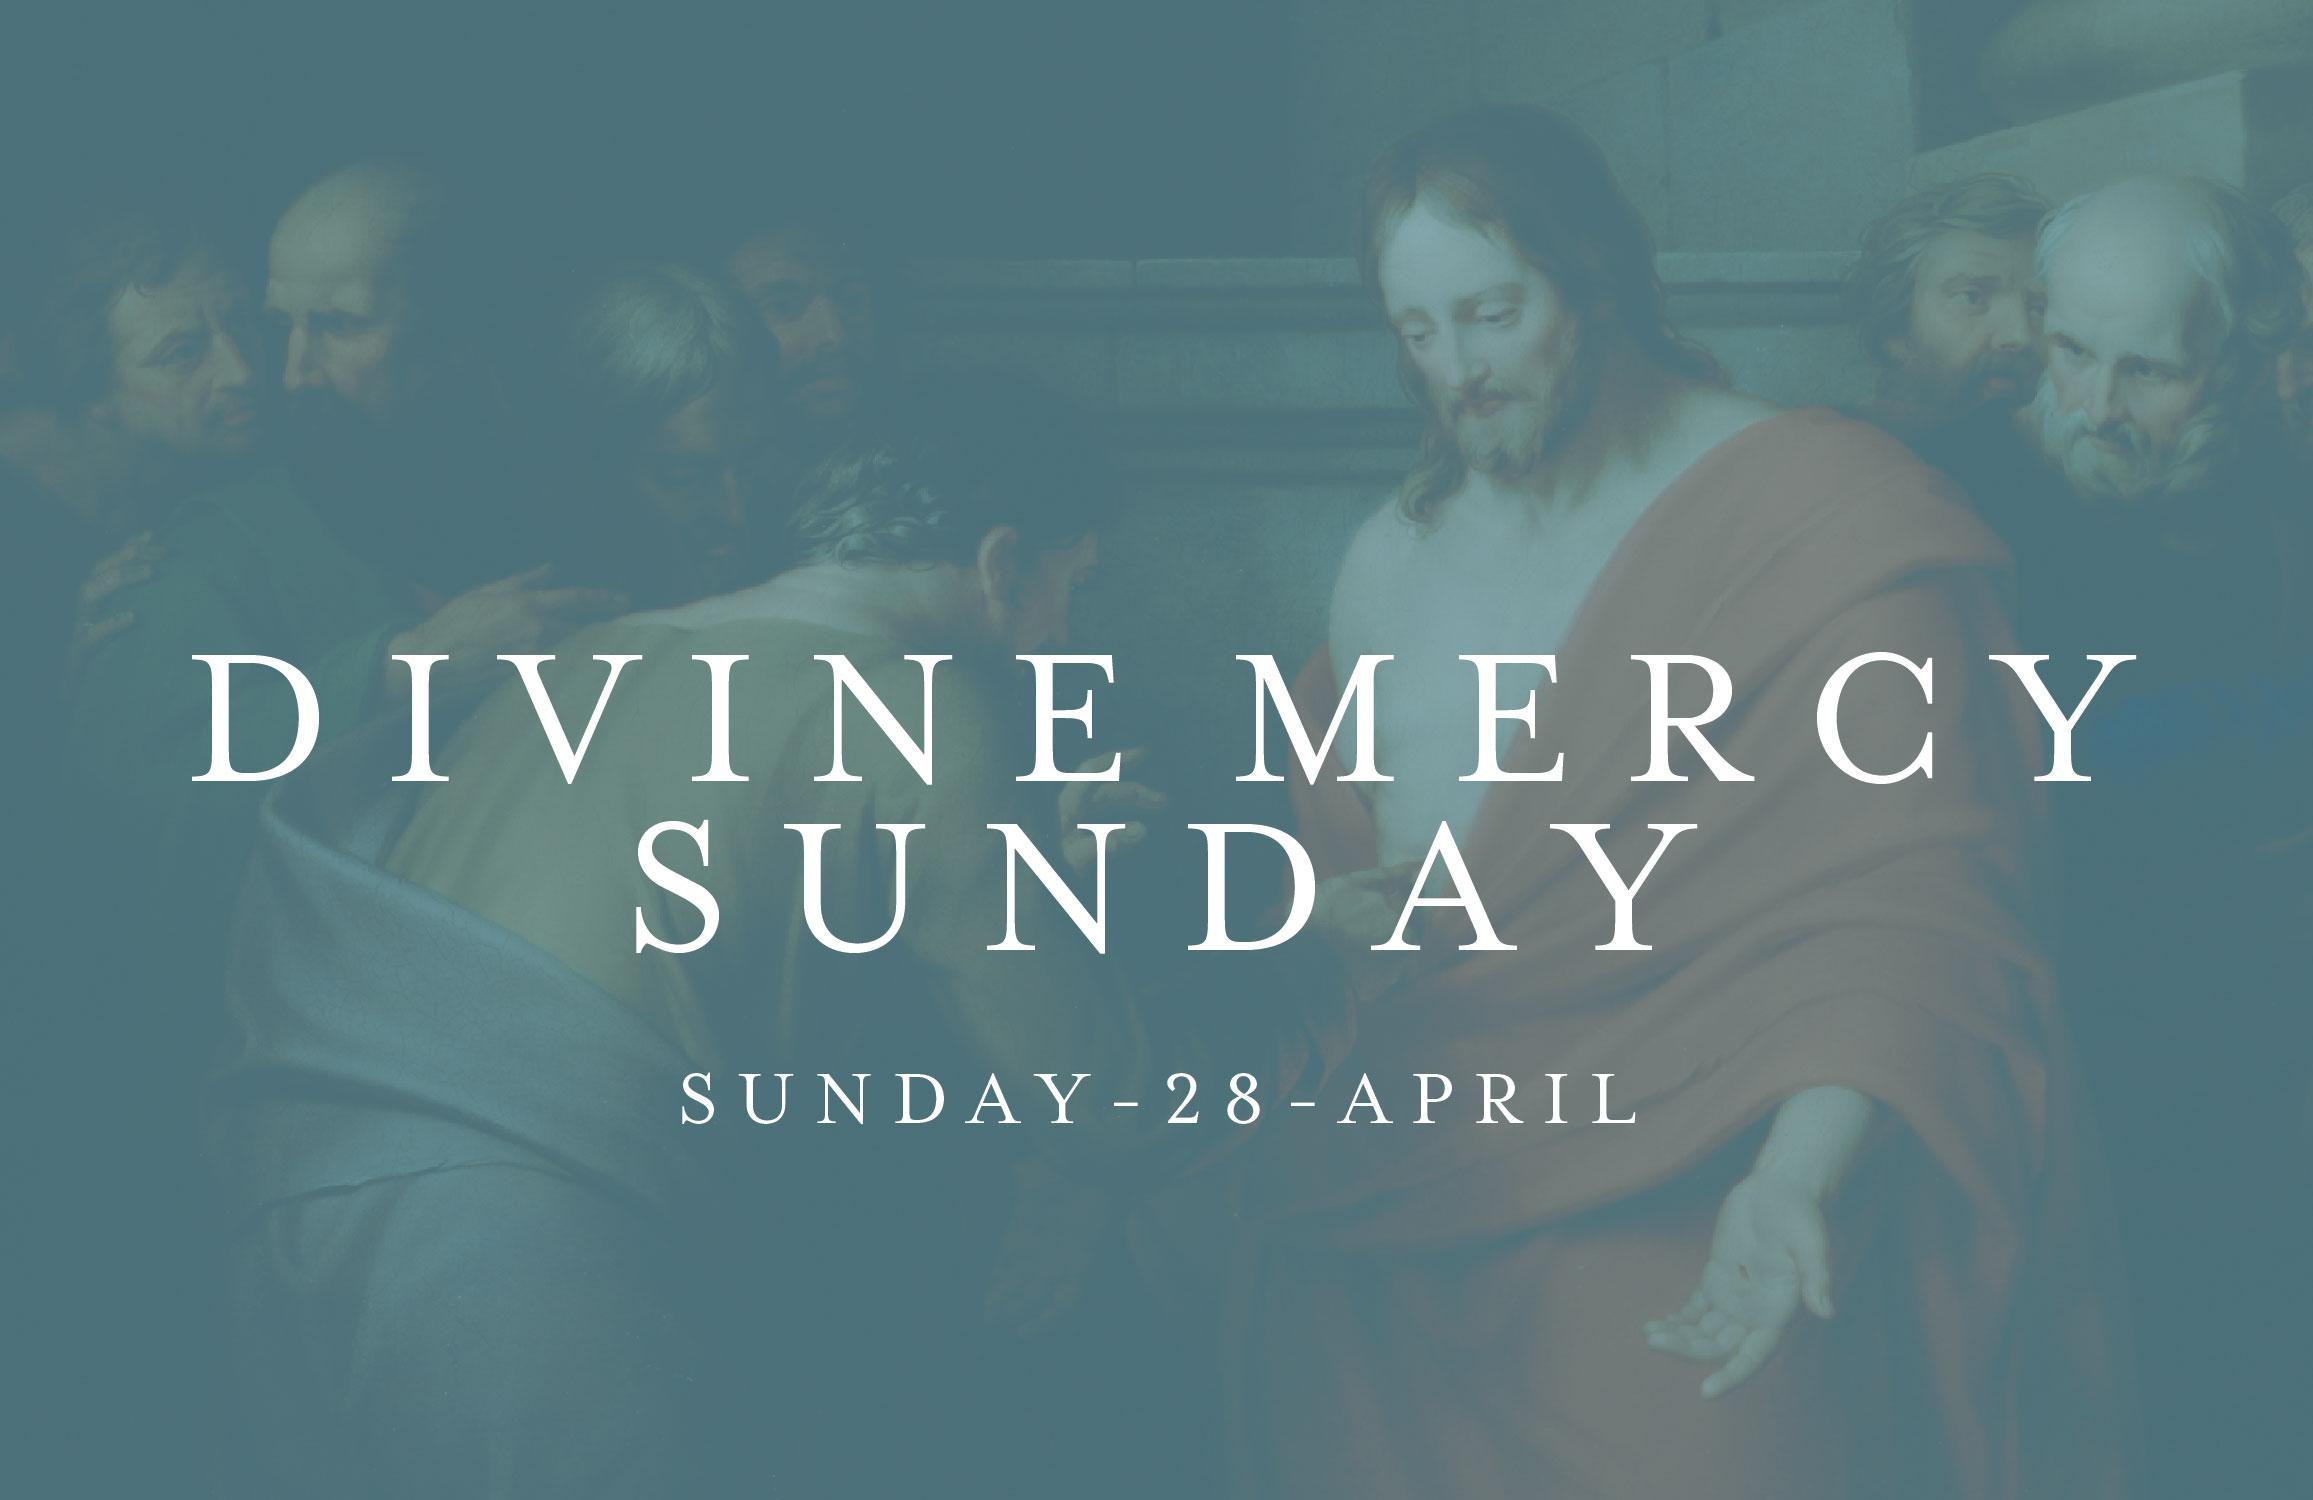 Divine Mercy Sunday